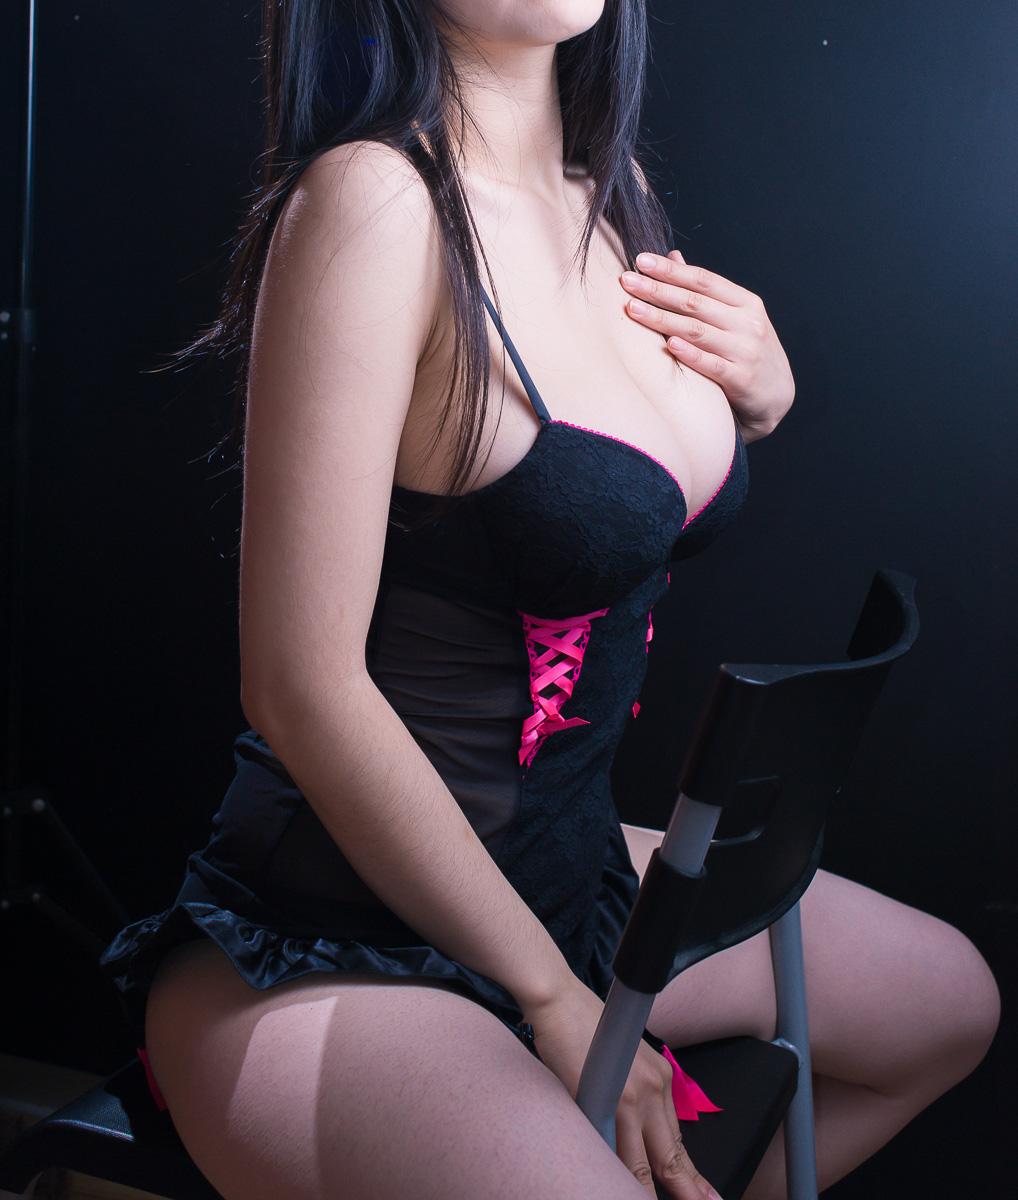 Asian-Model-Jasmine-Lee-Big-Boobs-www.ohfree.net-007 Sexy Asian Model Jasmine Lee Topless Show Big Boobs Photos